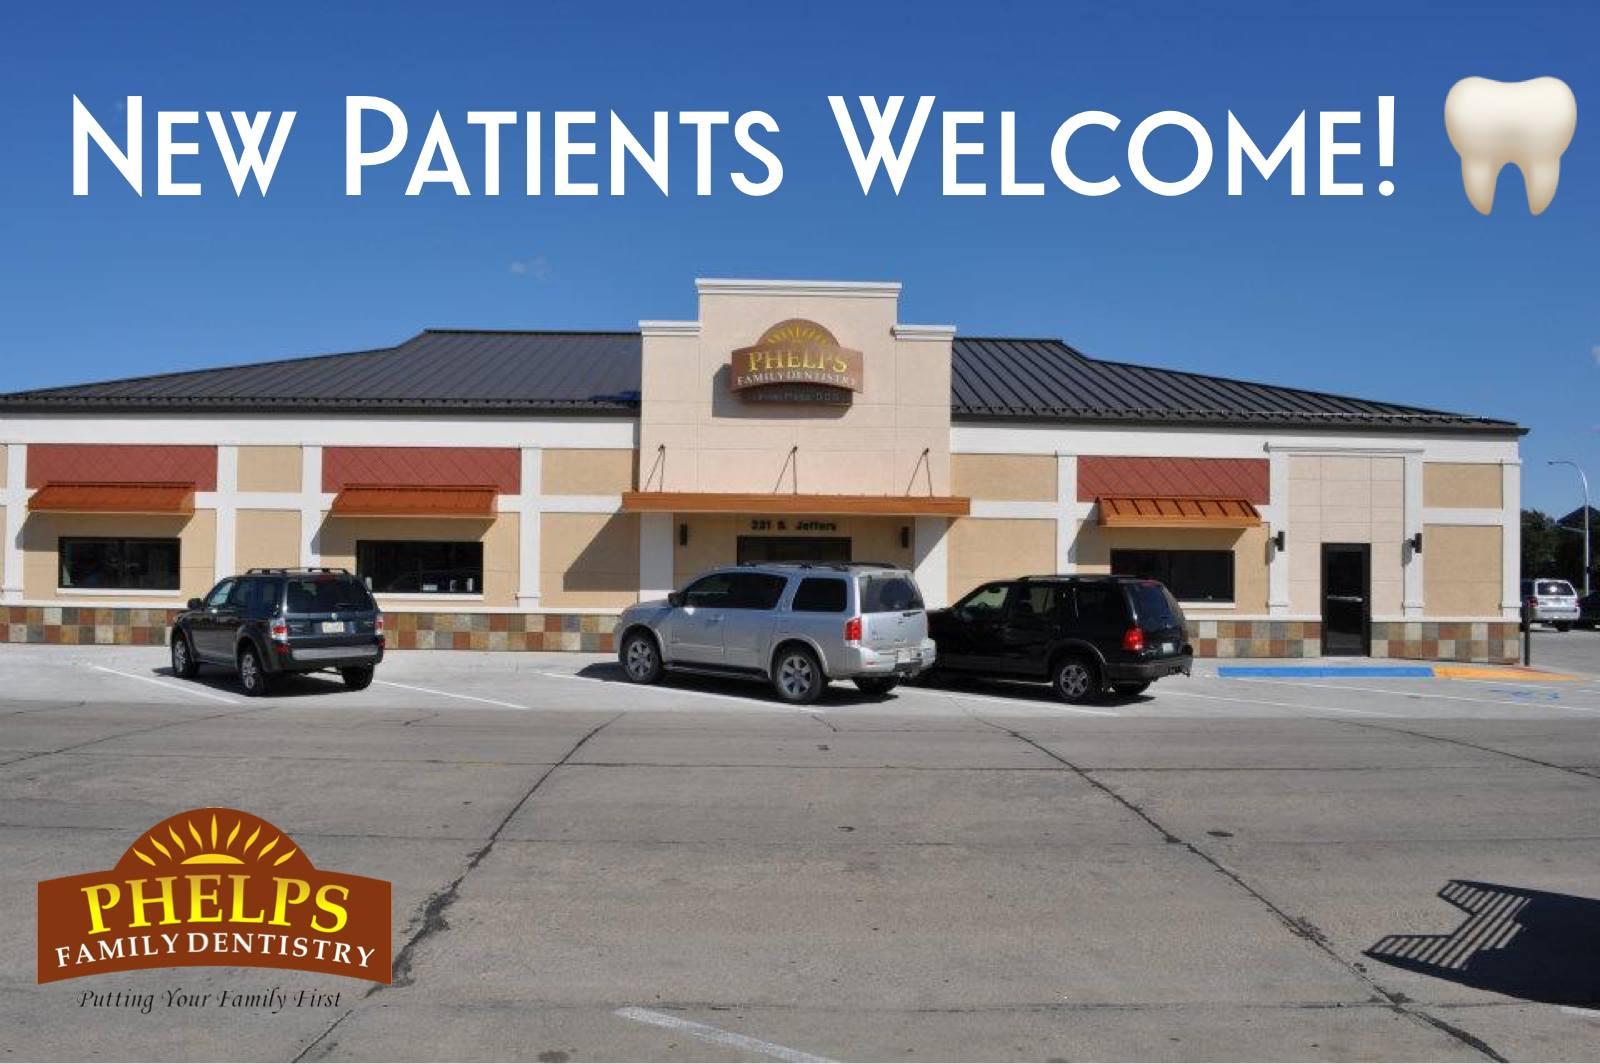 Nebraska's Top Rated Local® Dentists Award Winner: Phelps Family Dentistry